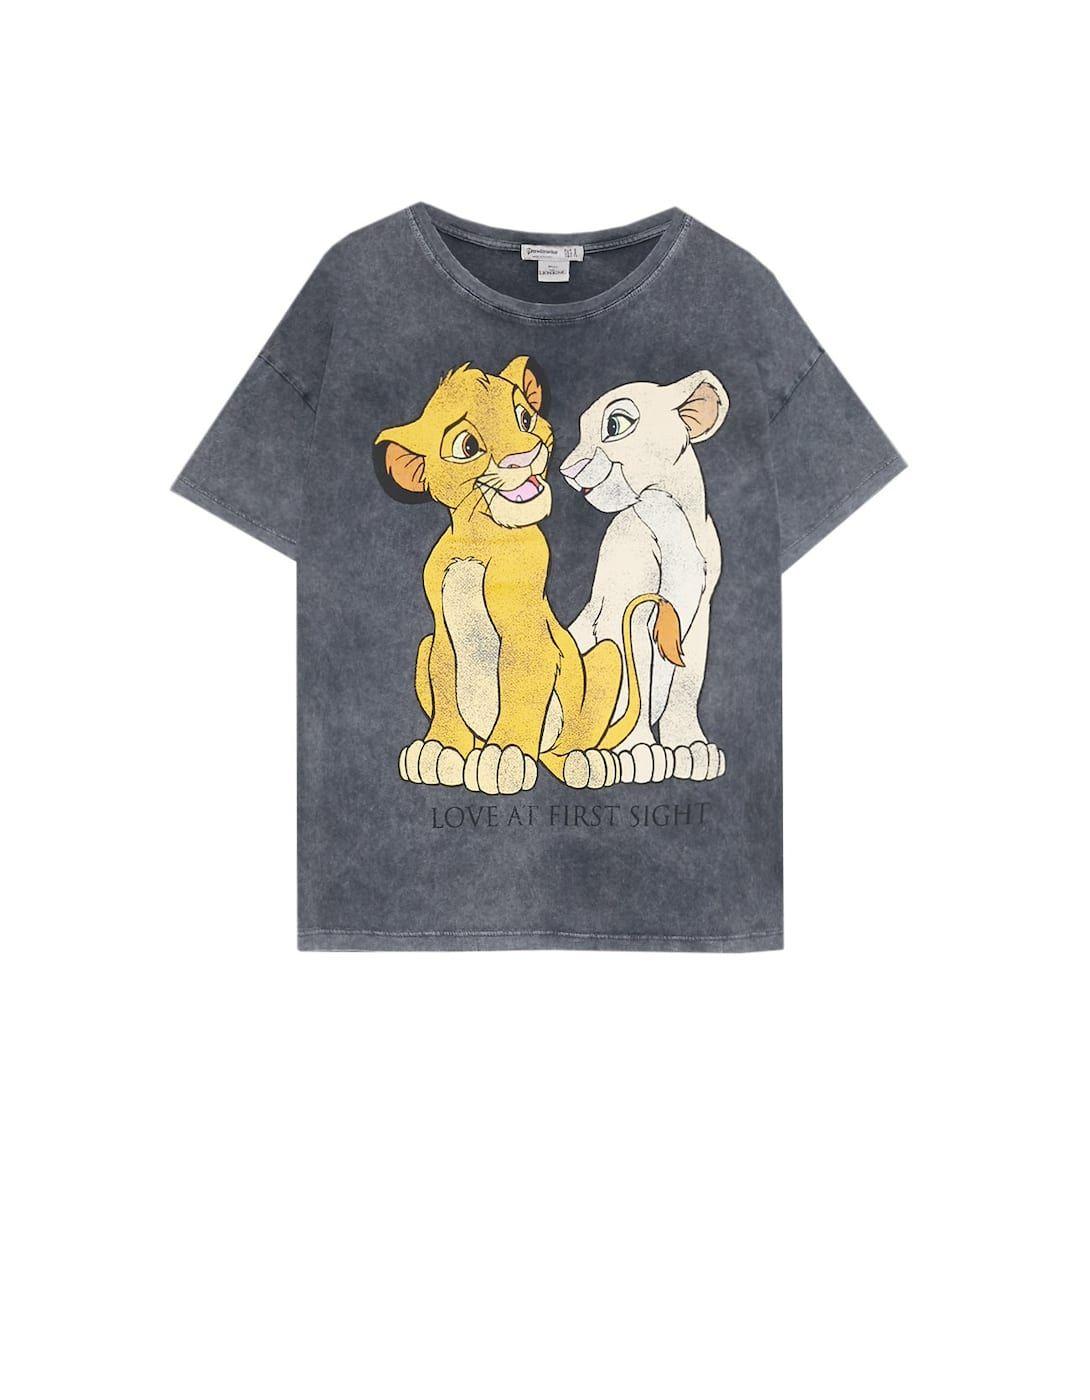 4ef1a8d70998 Disney Lion King t-shirt in 2019   Shopping   Disney lion king, T ...